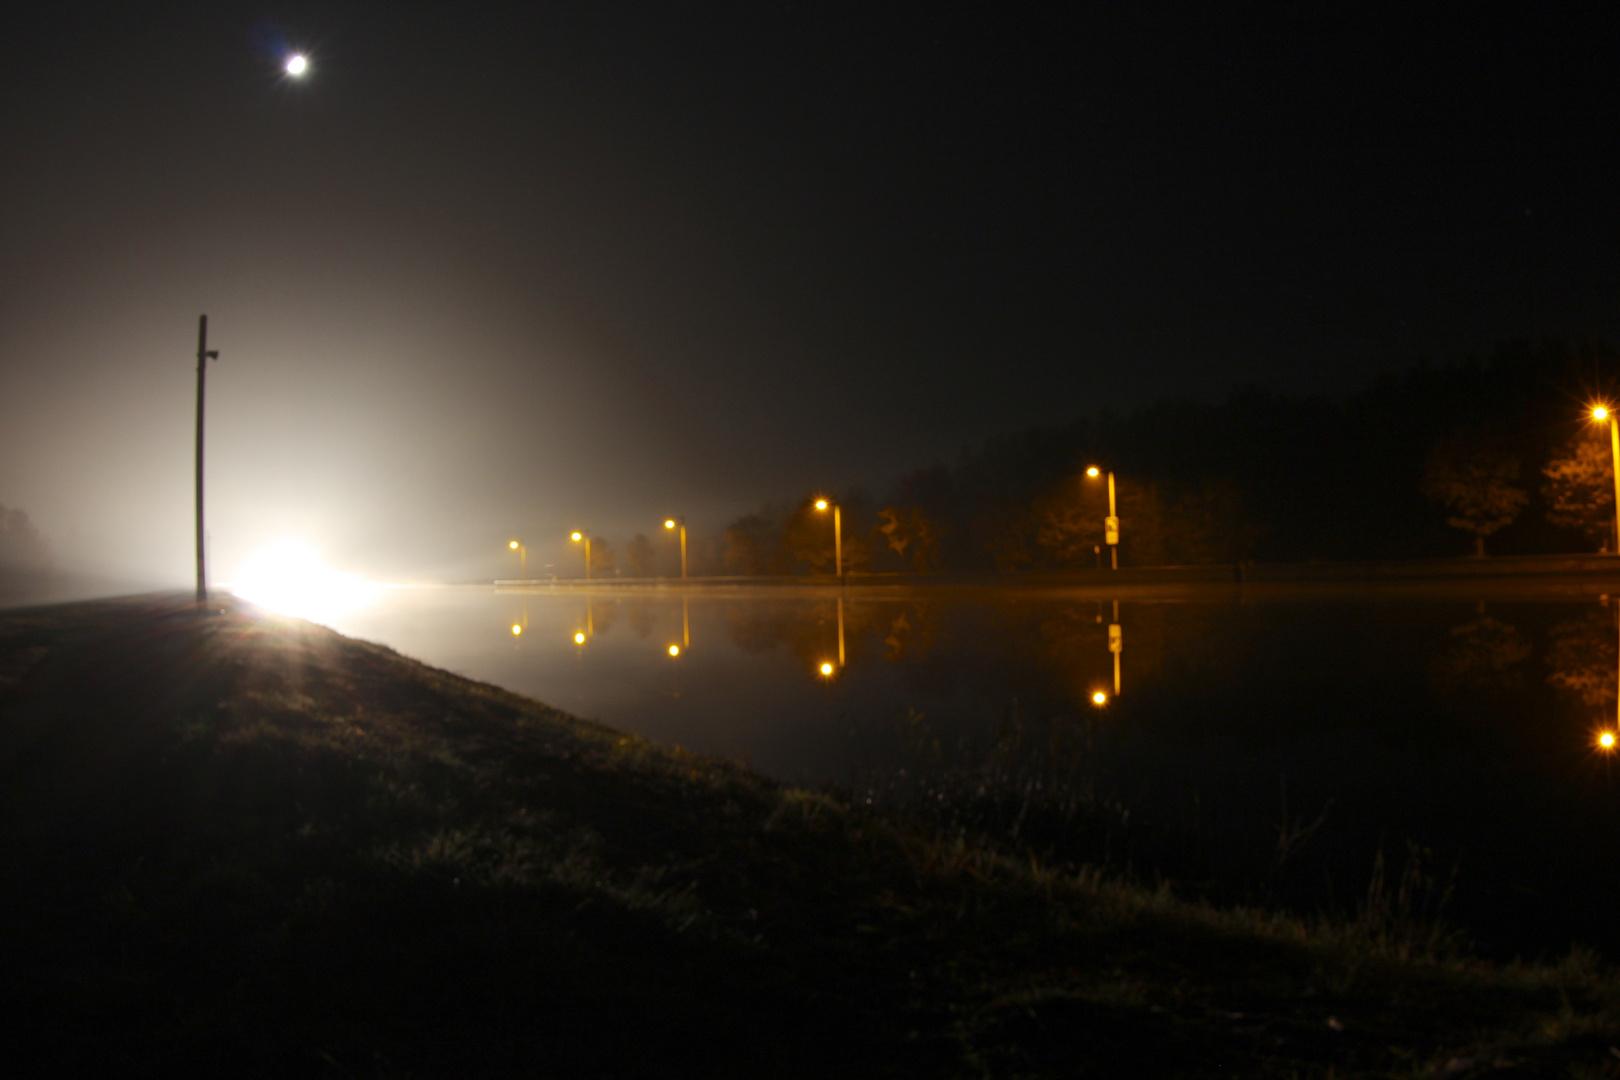 Main-Donau-Kanal bei Nacht.